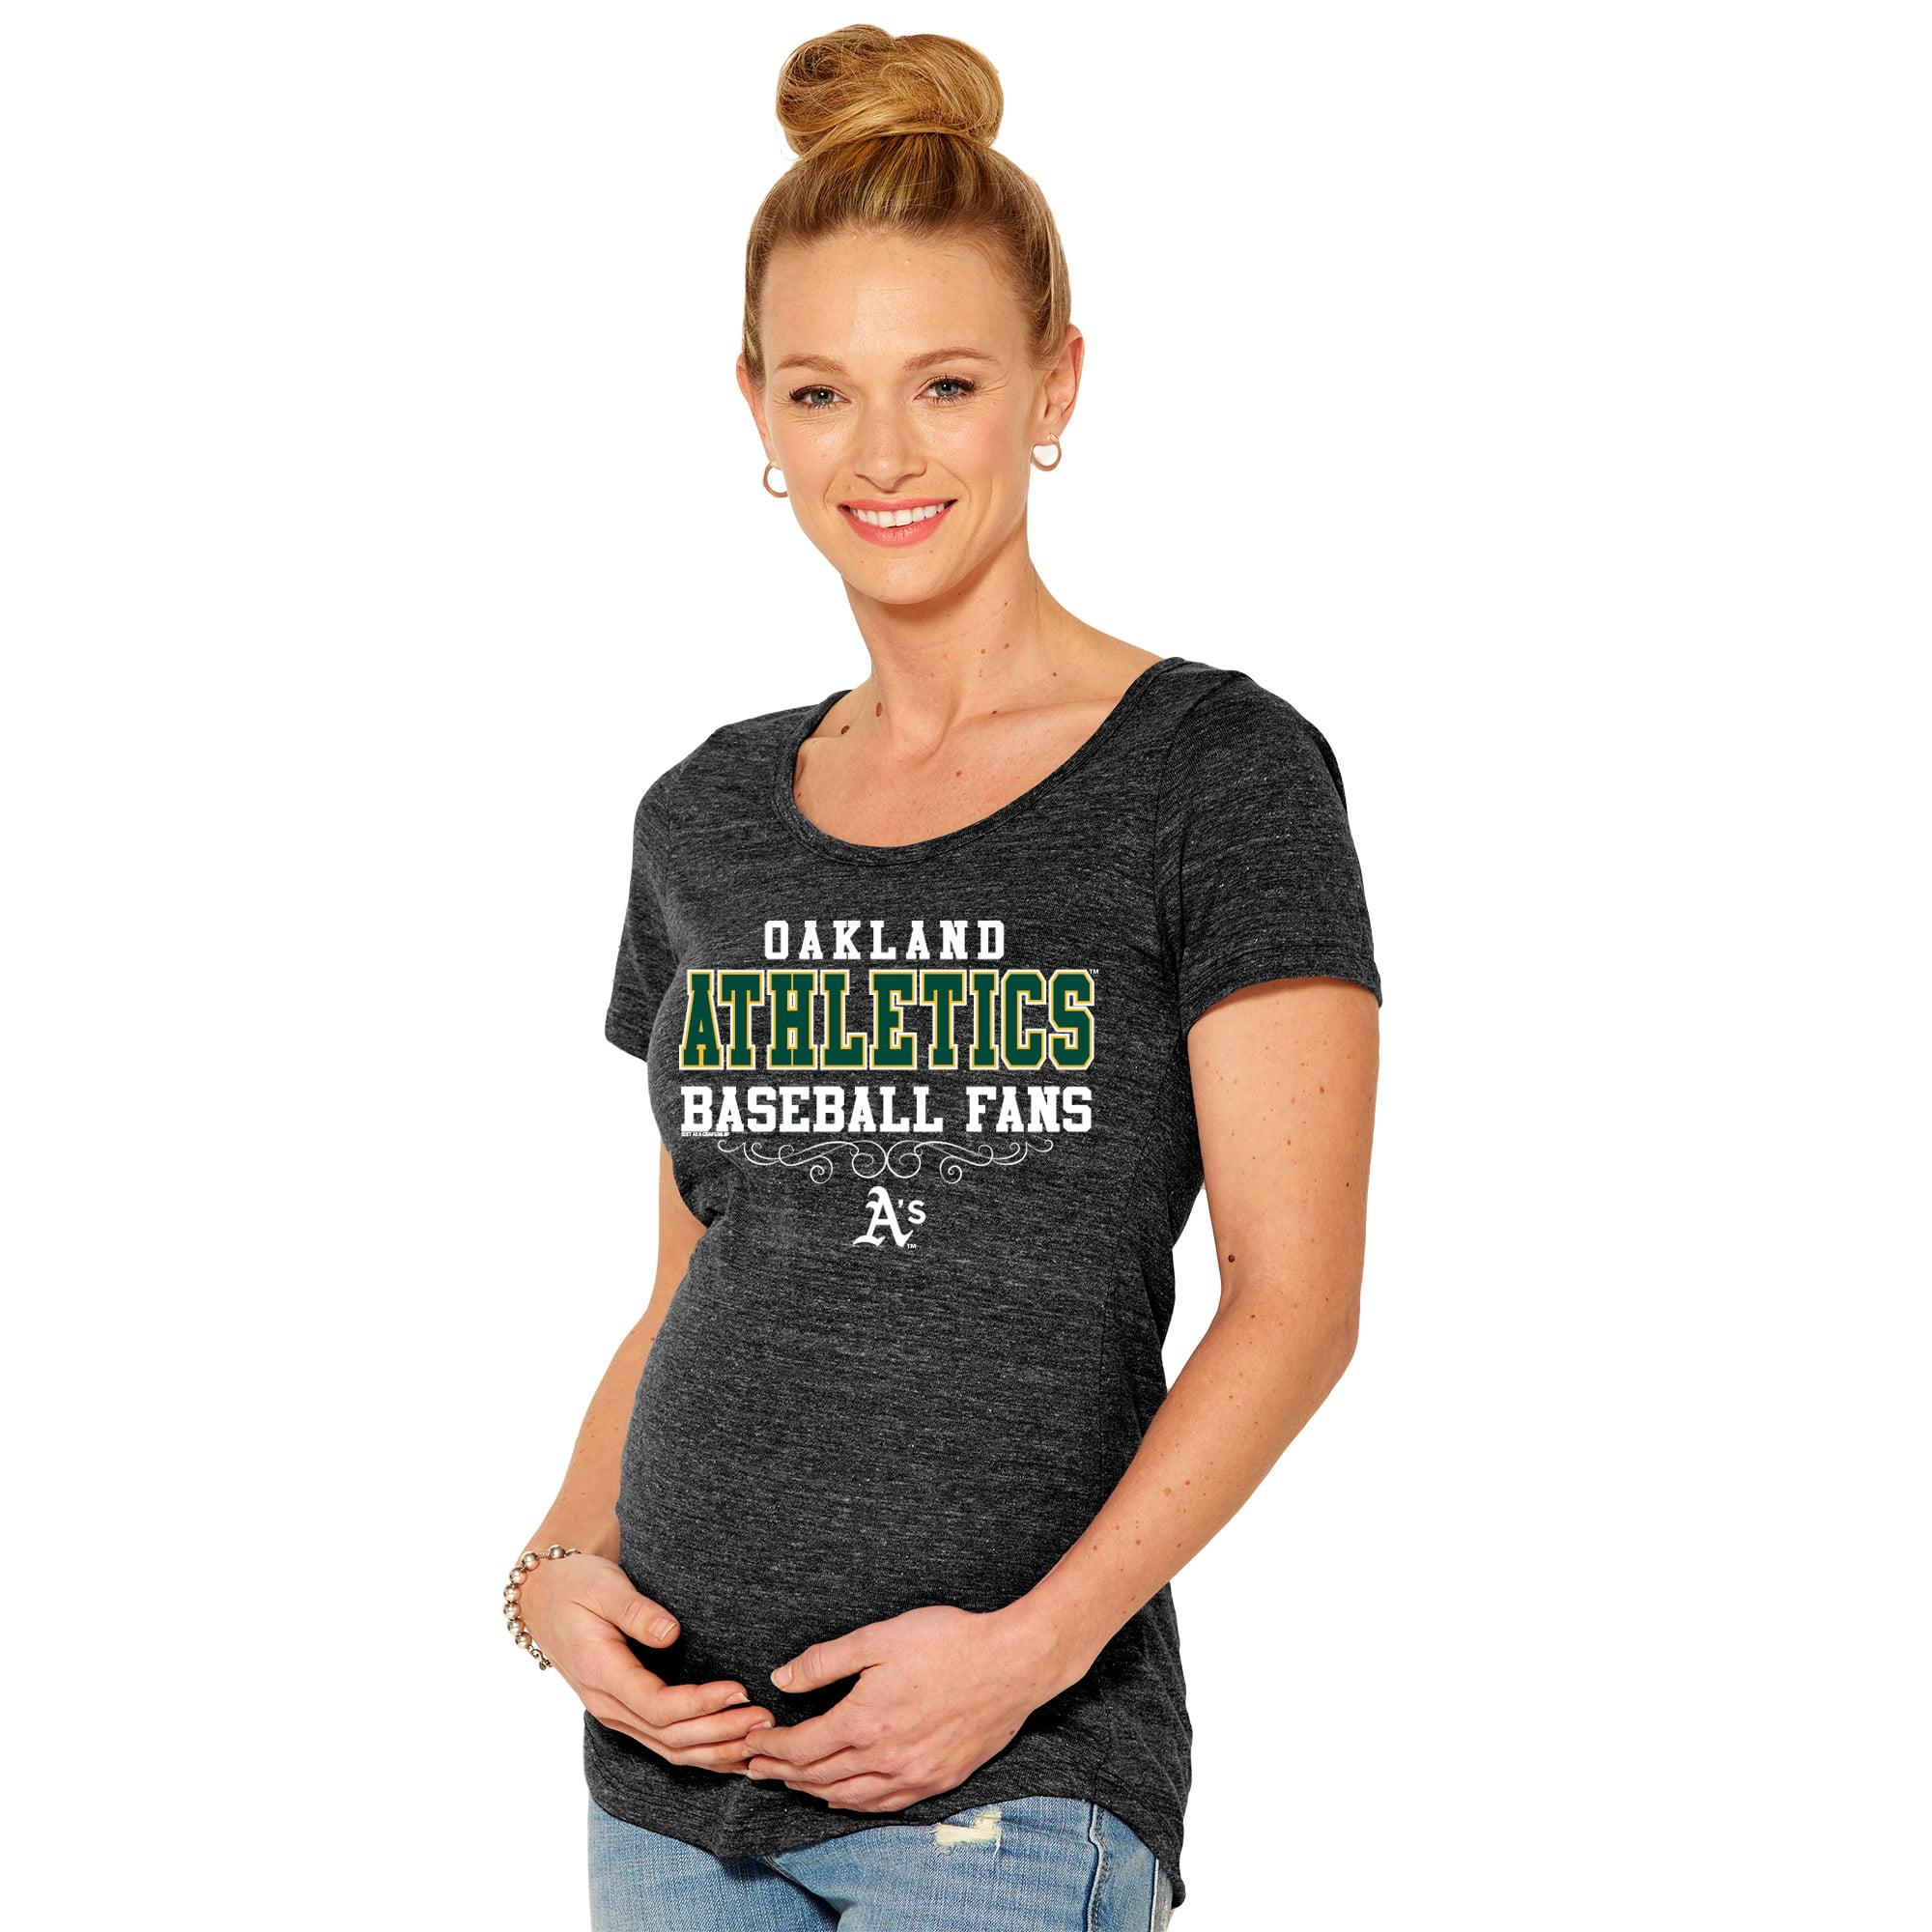 Oakland Athletics Soft As A Grape Women's Fans Tri-Blend Maternity T-Shirt - Black